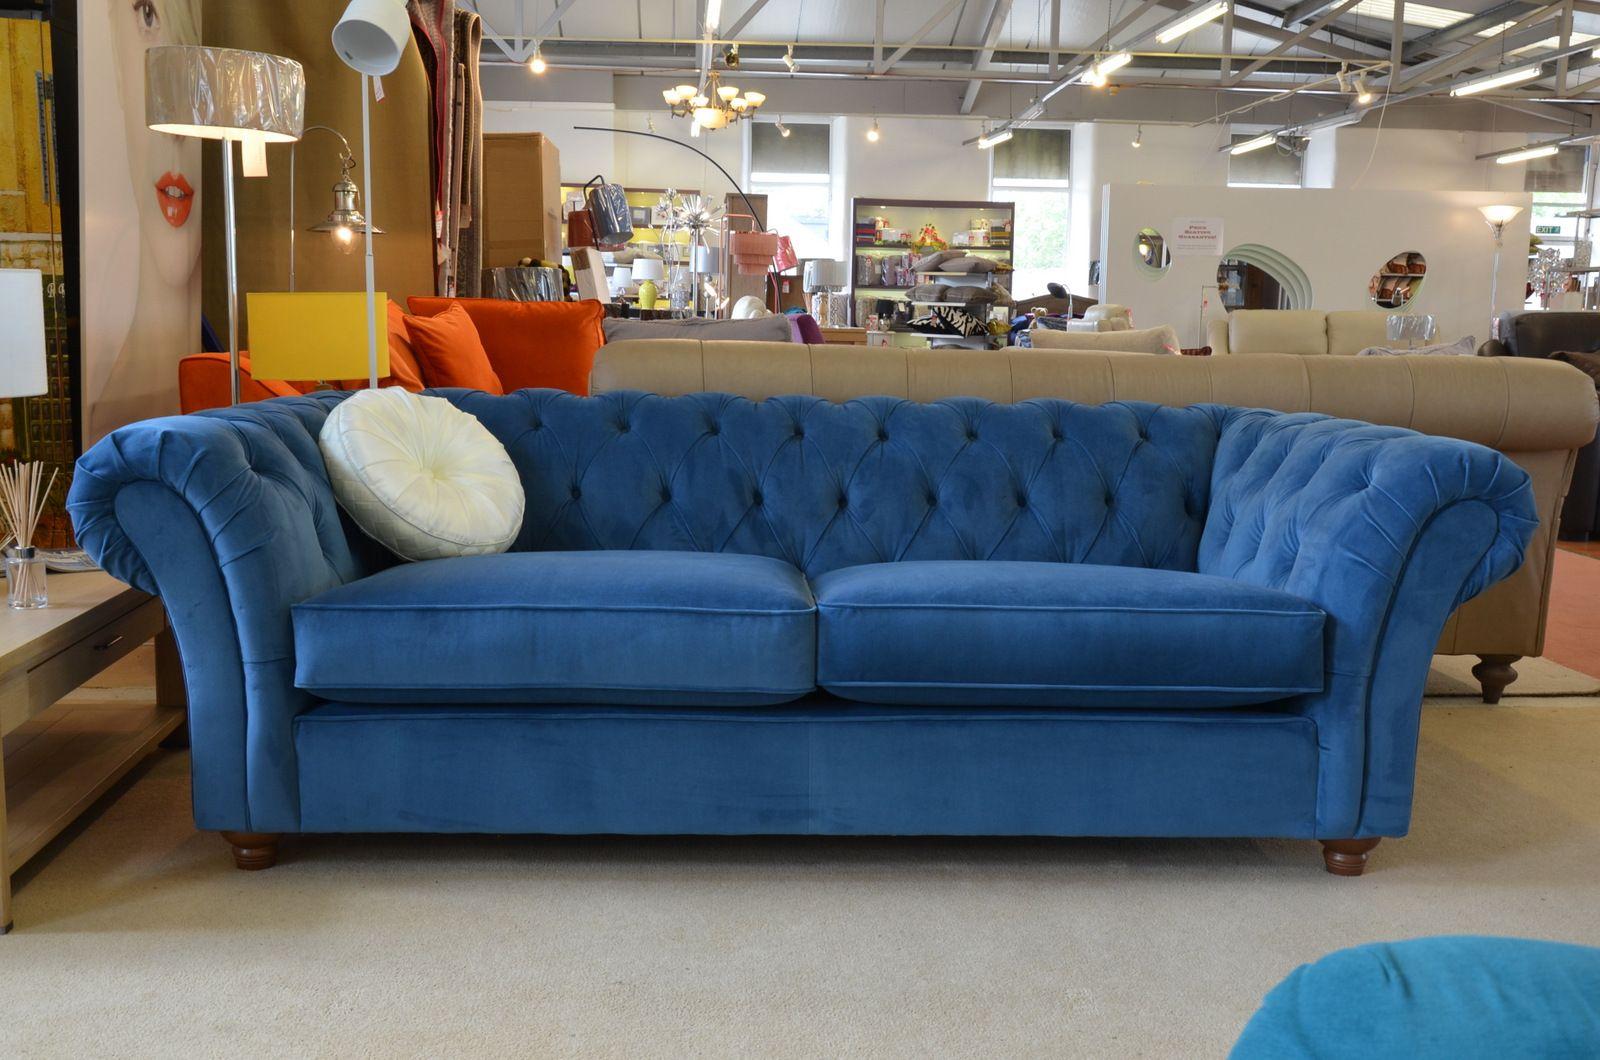 Maddox 3 Seater Chesterfield Sofa in Blue Velvet